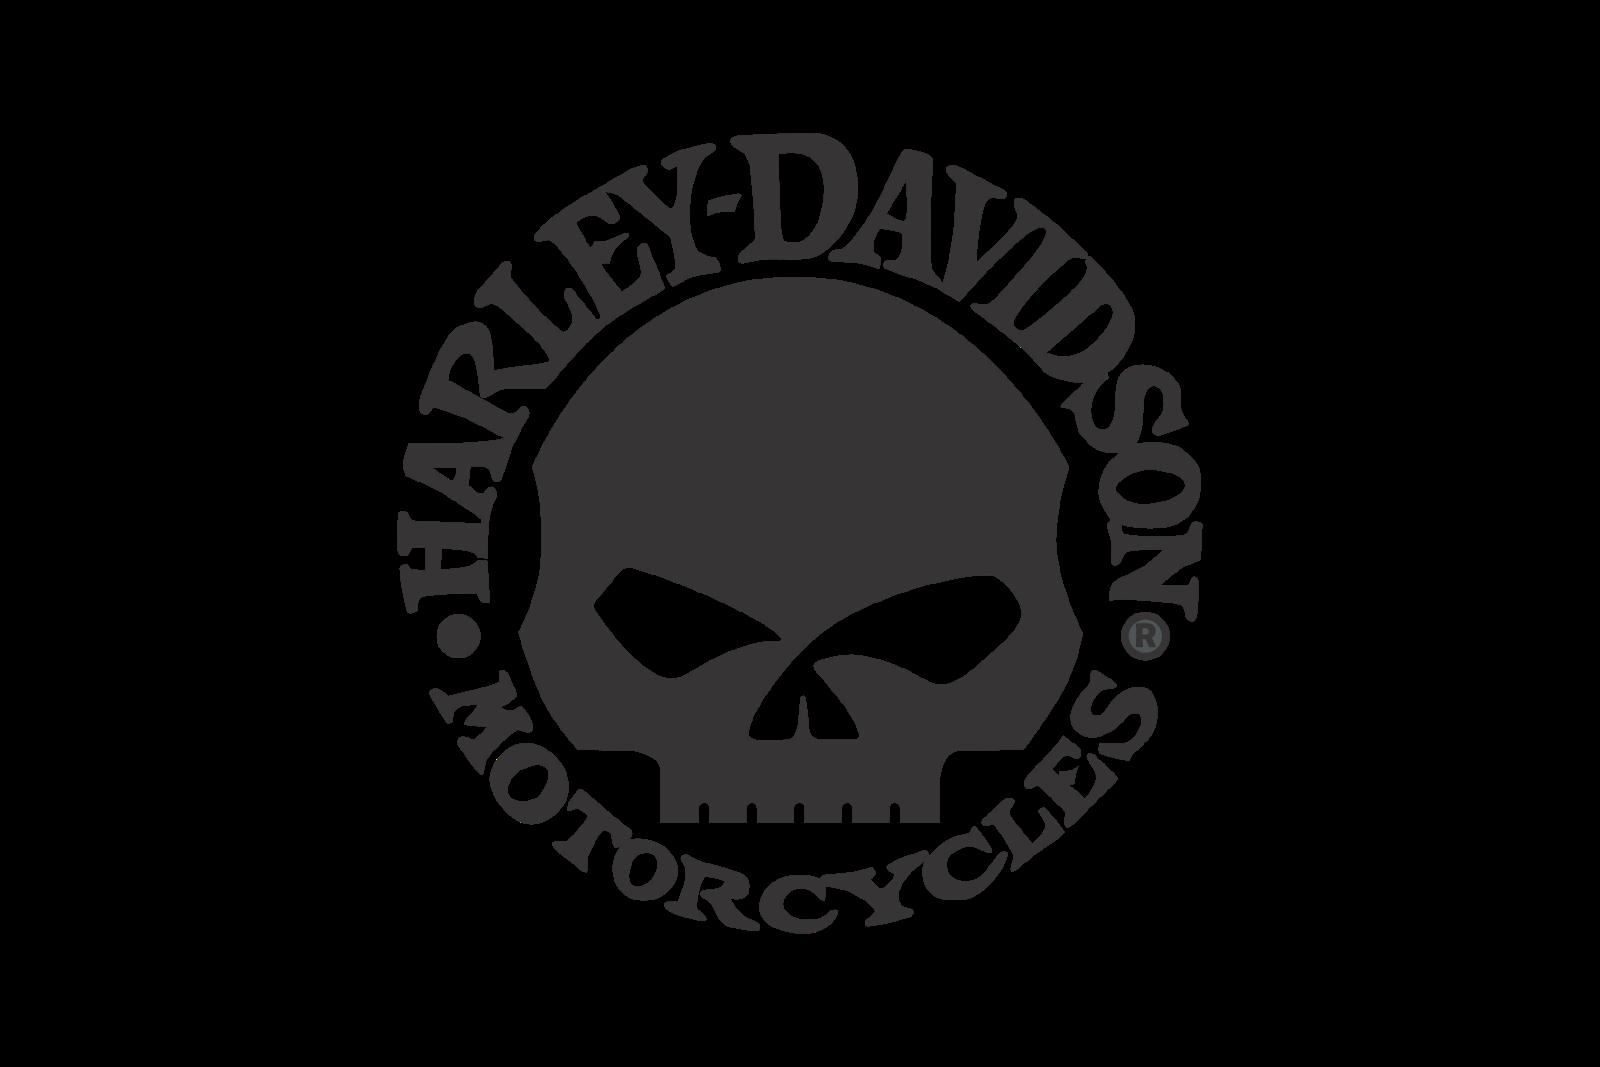 harley davidson skull logo logo share logo harley davidson a imprimer lego harley davidson